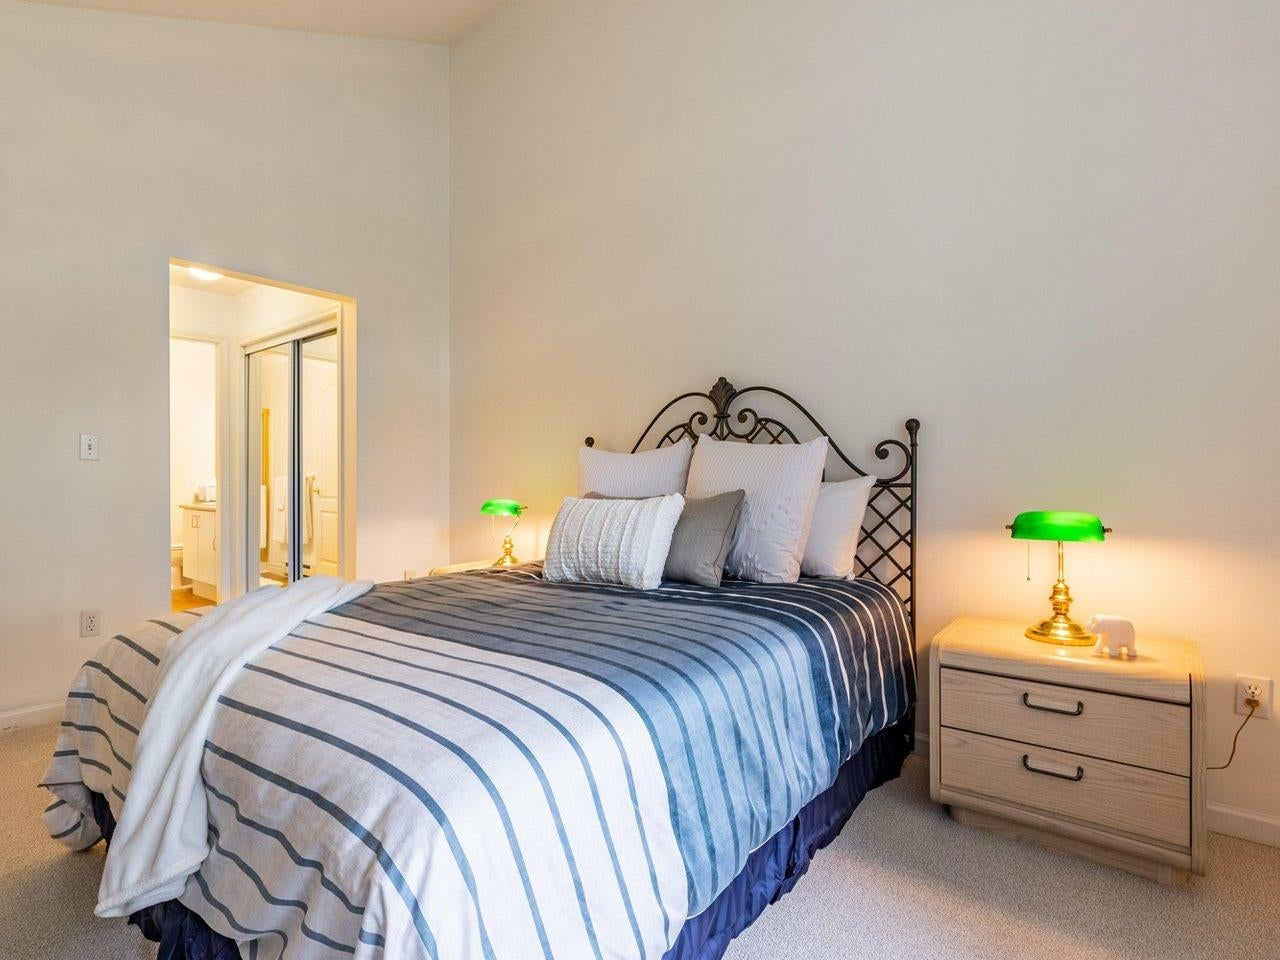 306 15298 20 AVENUE - King George Corridor Apartment/Condo for sale, 2 Bedrooms (R2625551) - #22